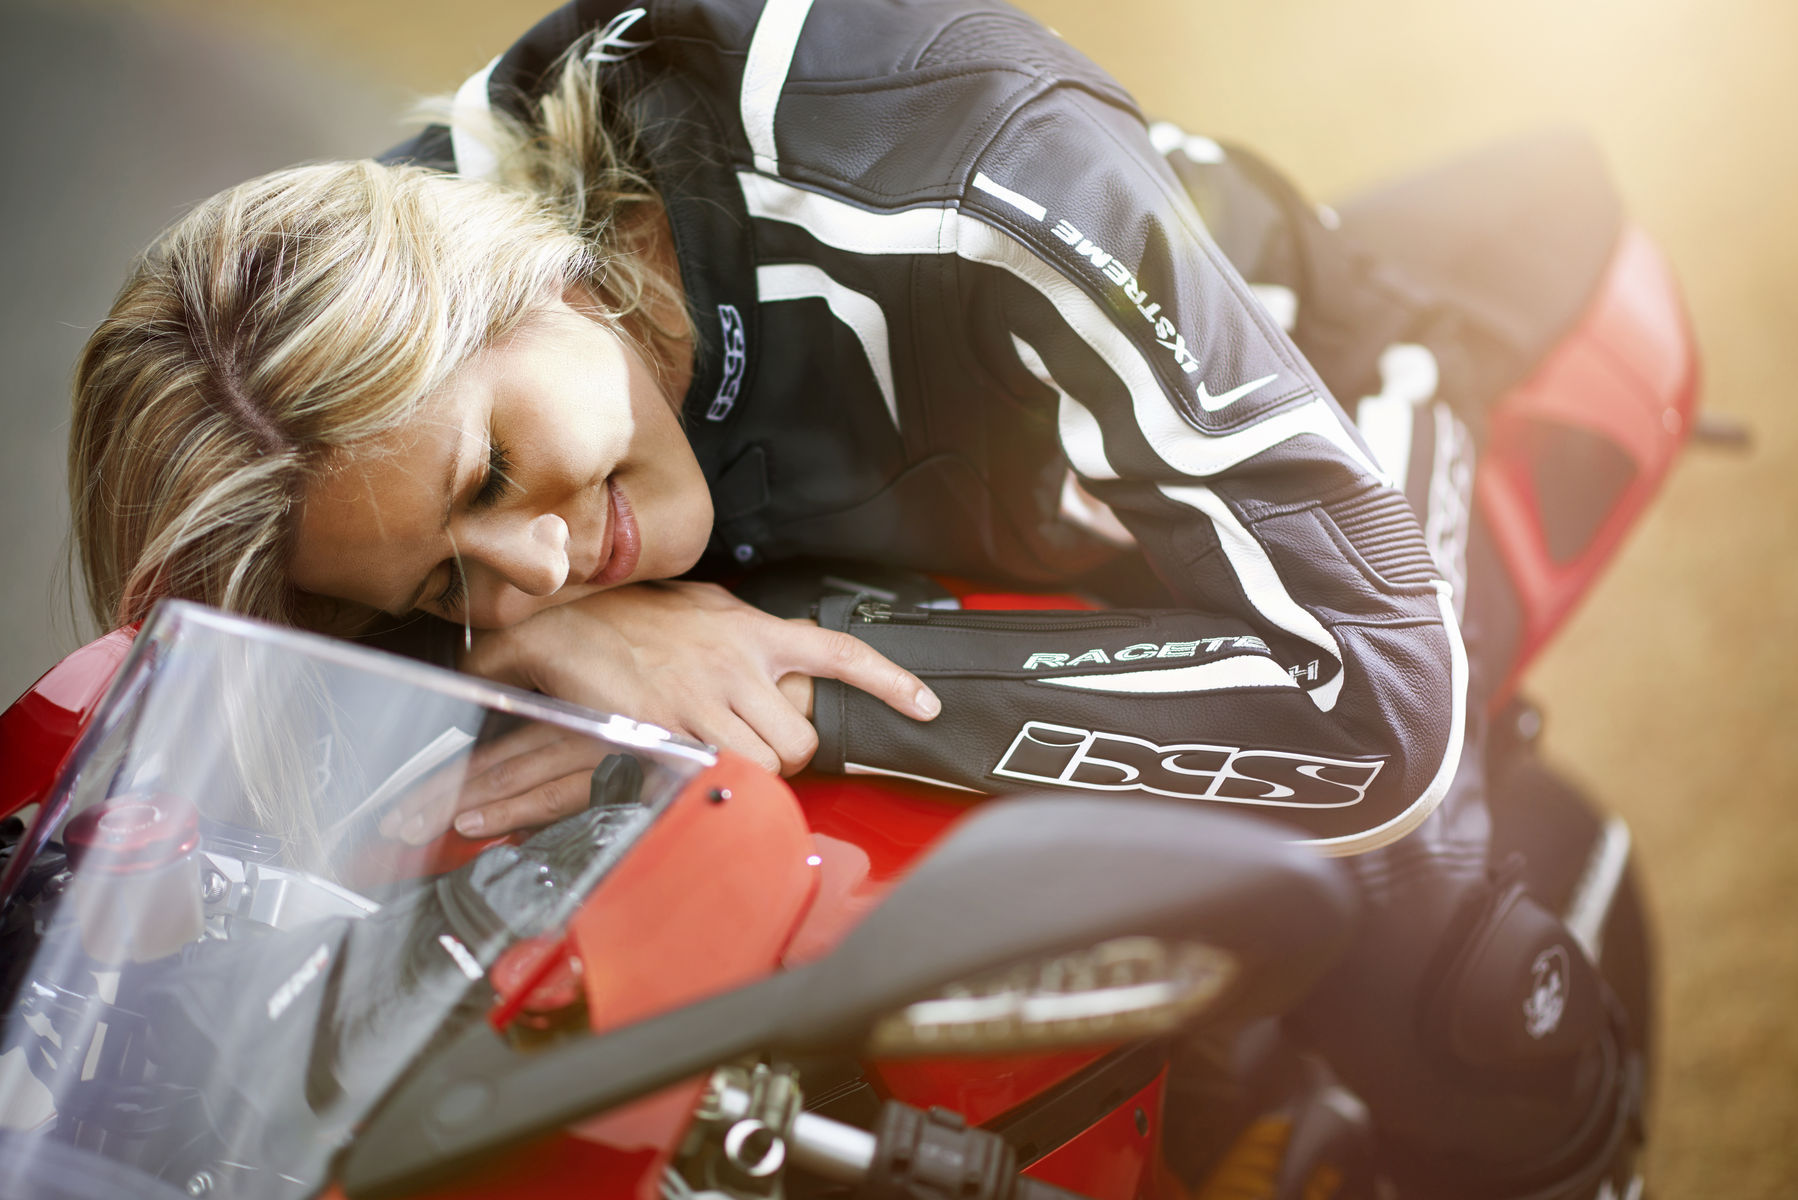 | Motorcycle love